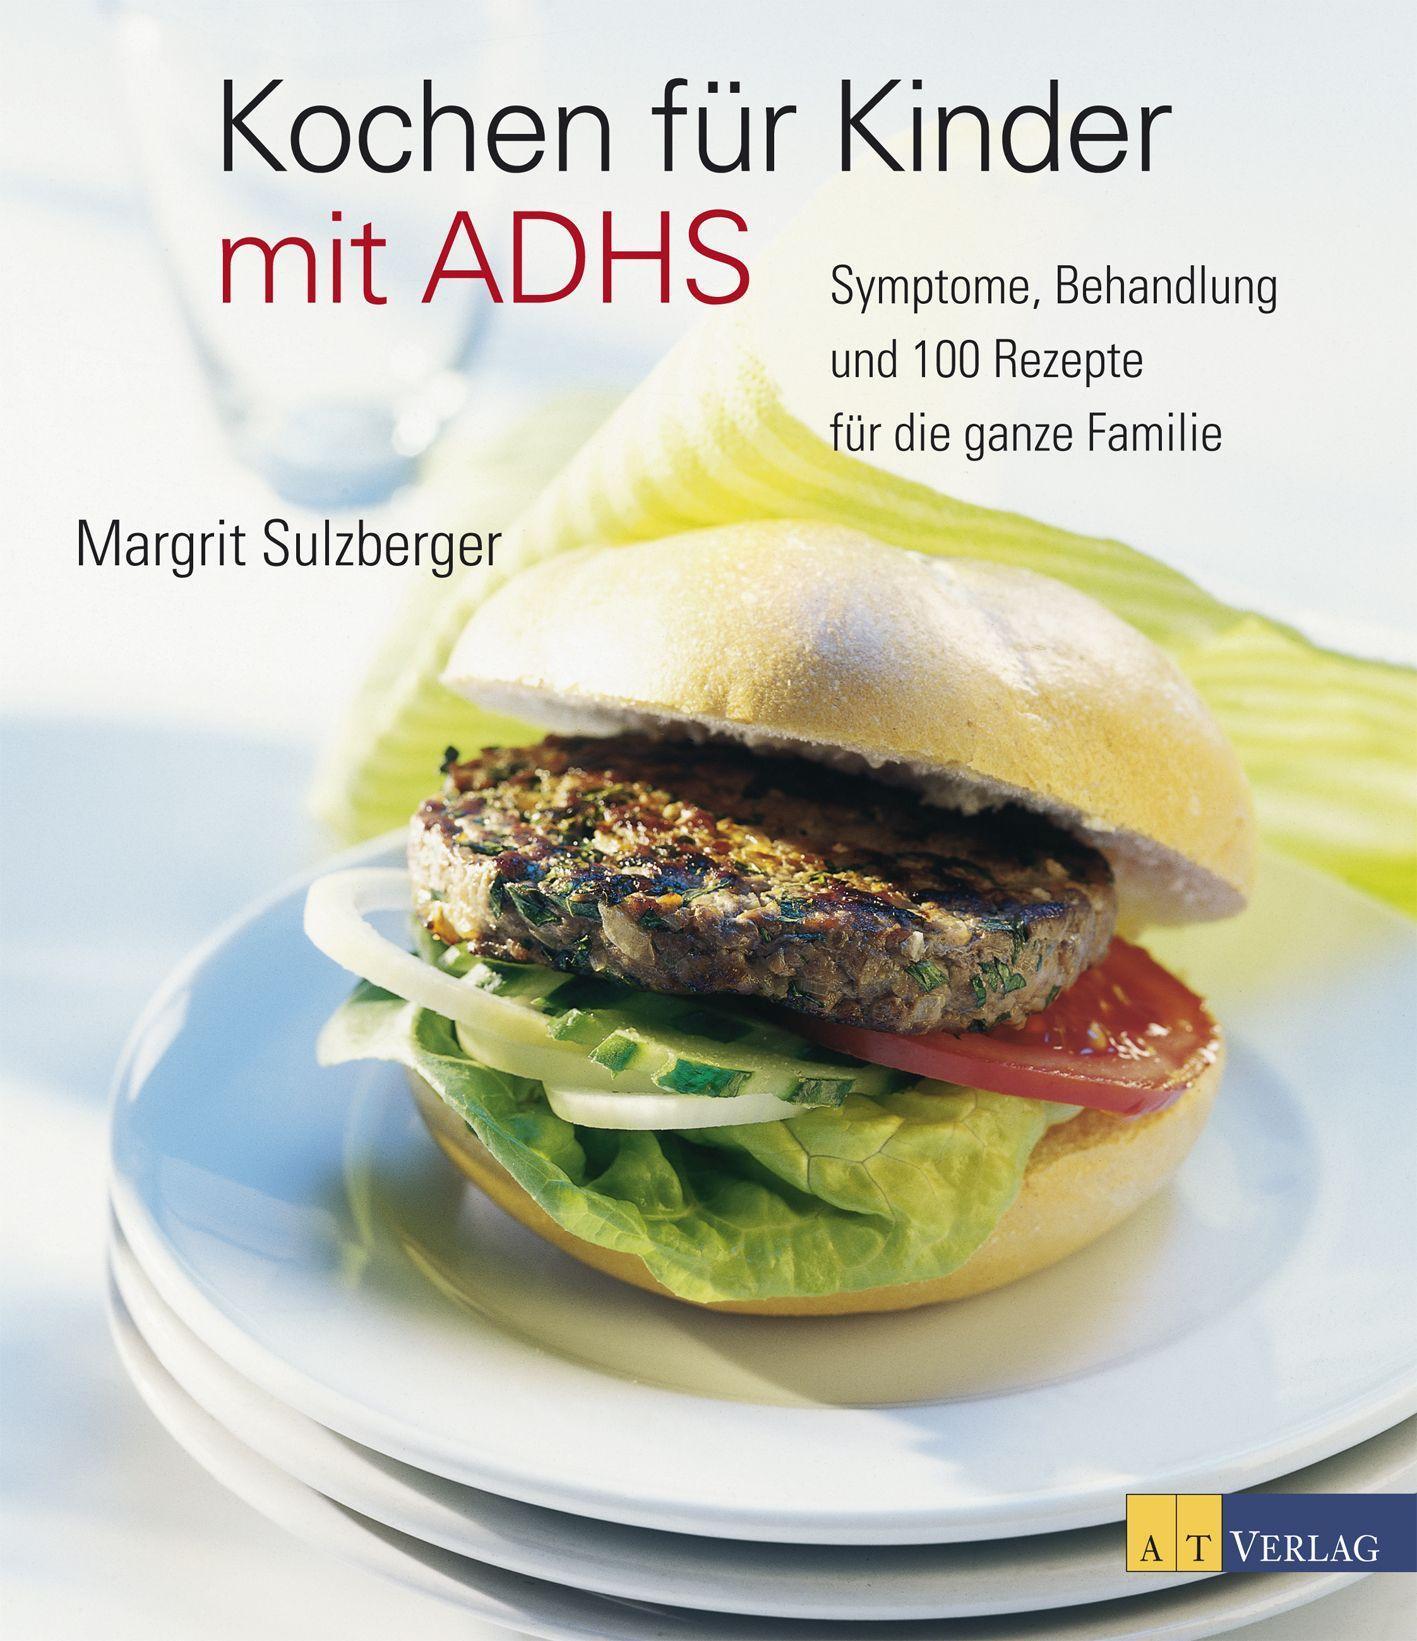 Kochen-fuer-Kinder-mit-ADHS-Margrit-Sulzberger